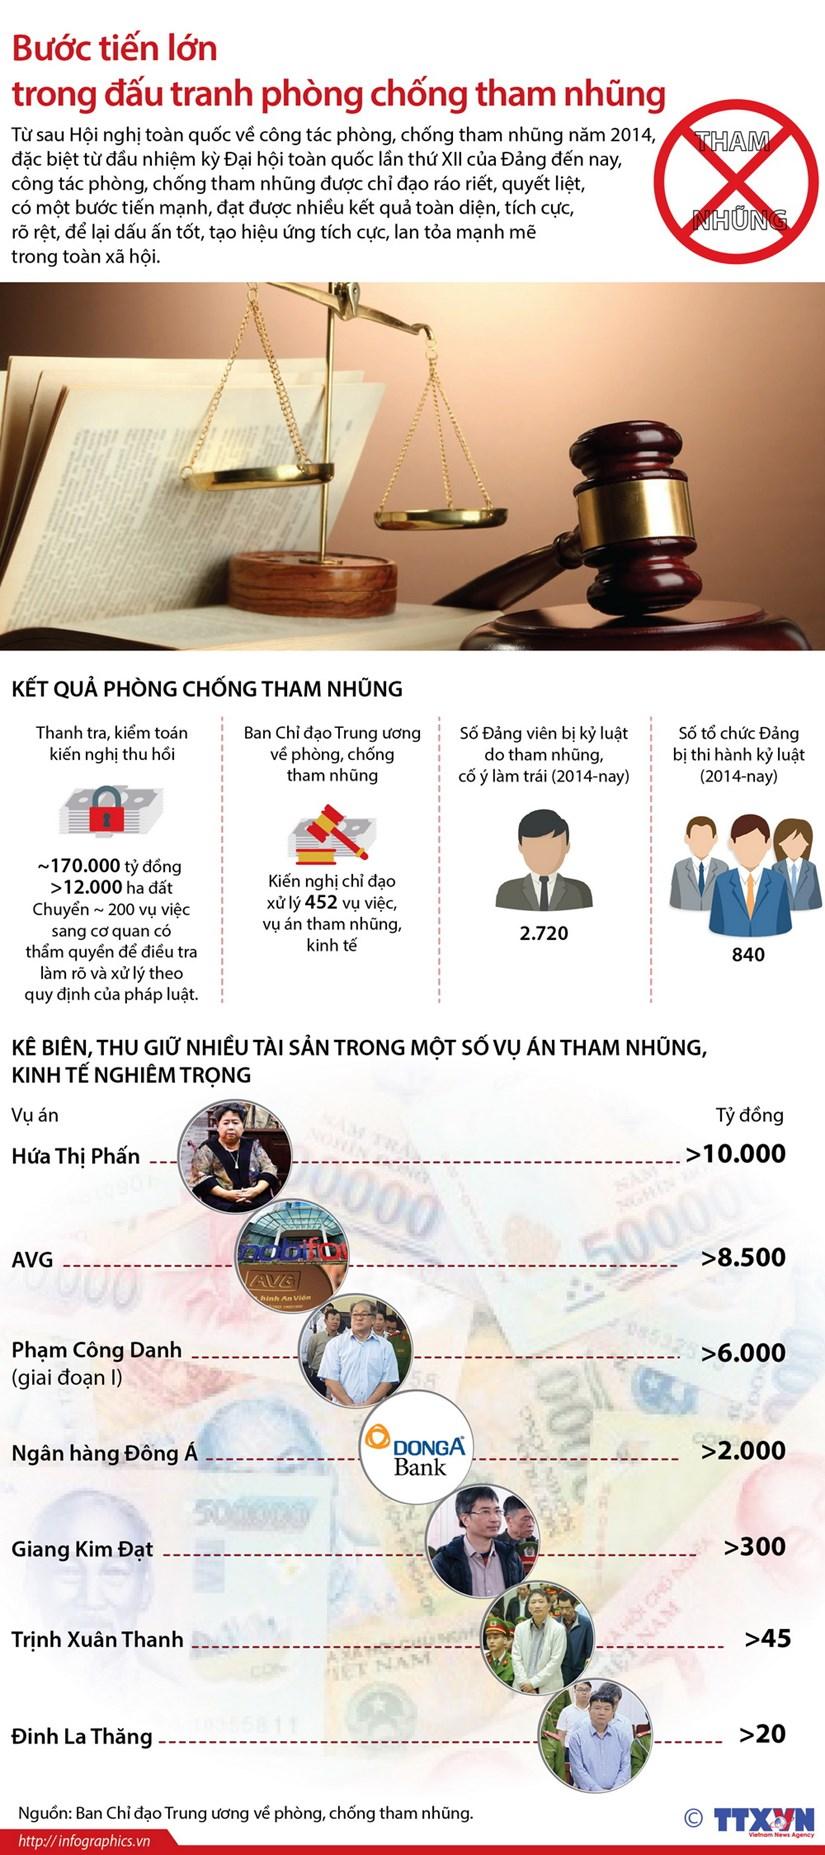 [Infographics] Buc tranh ket qua phong chong tham nhung hinh anh 1